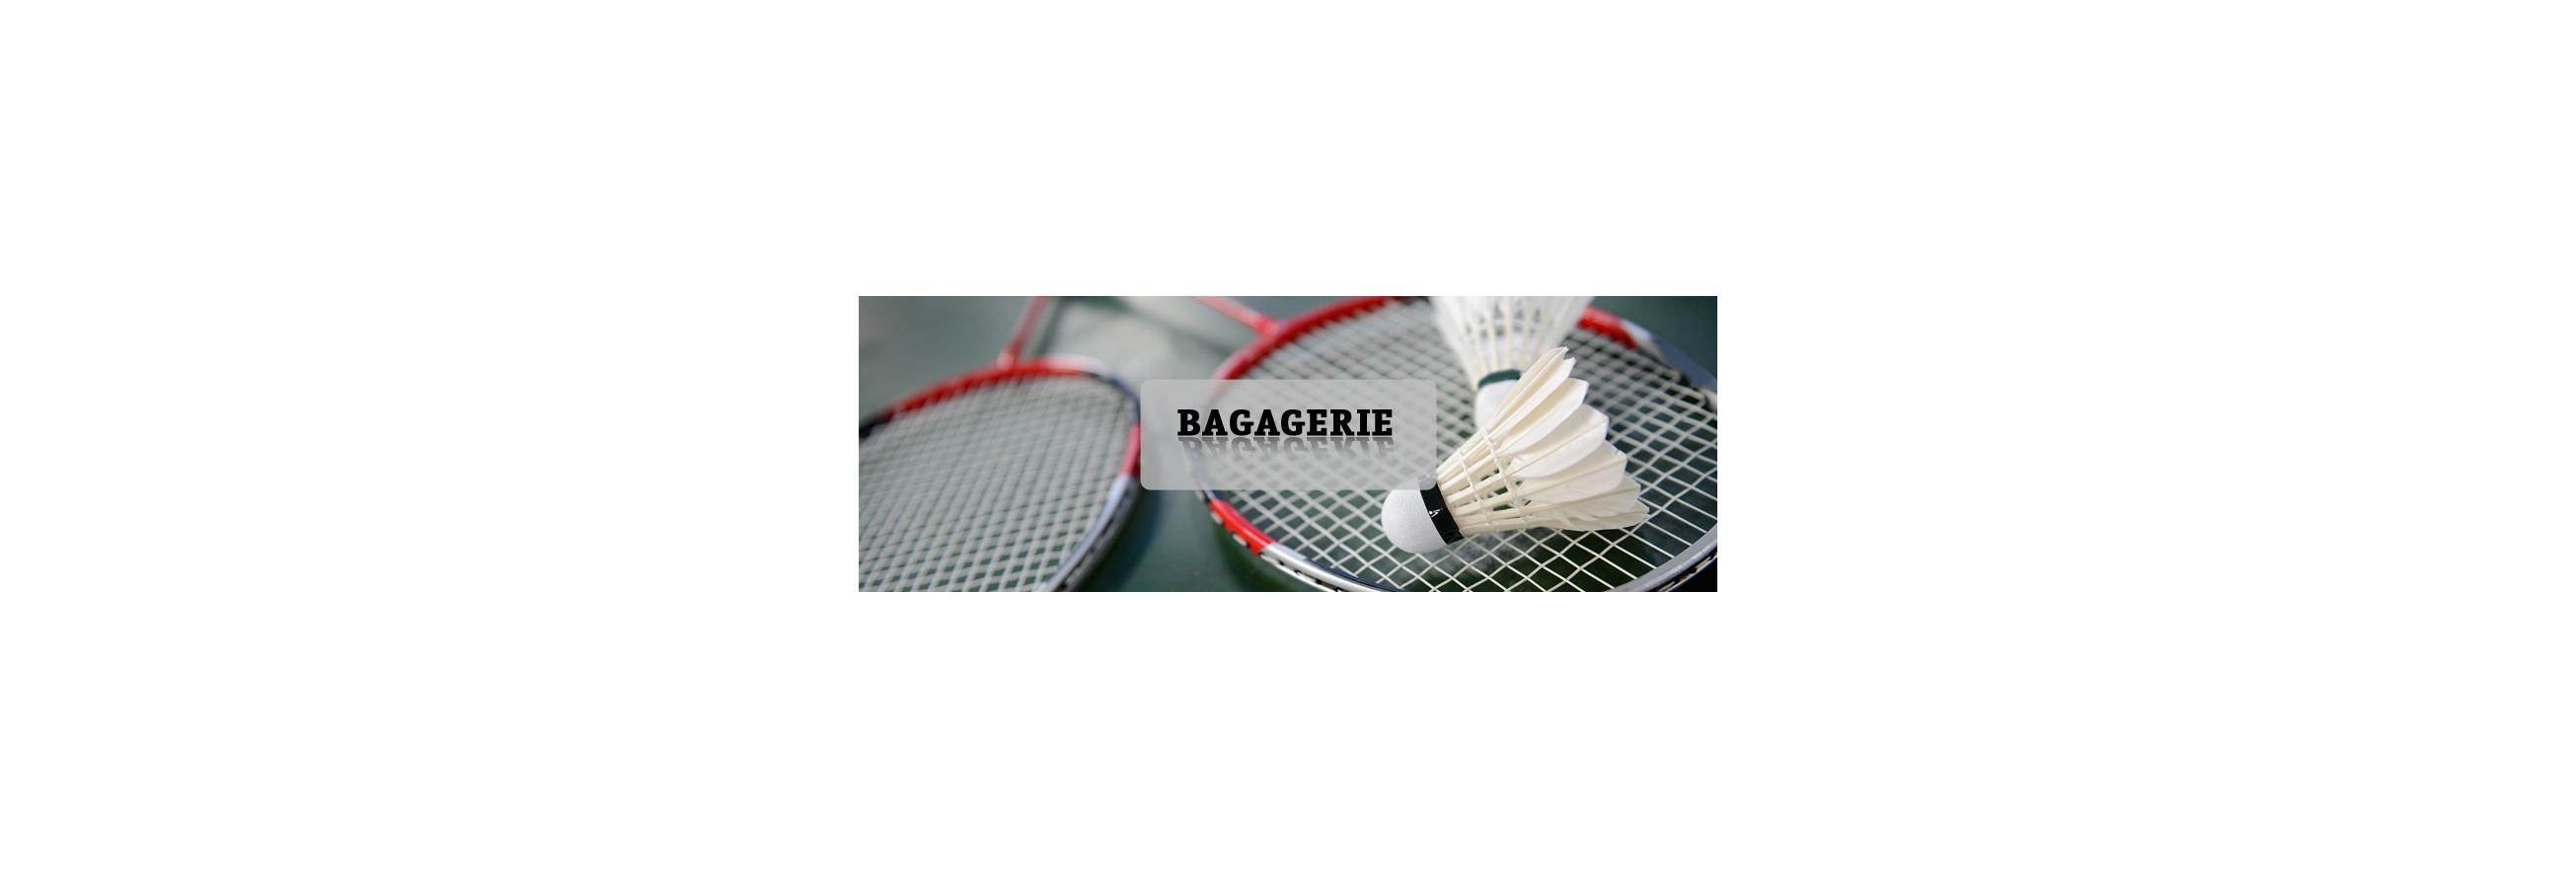 BAGAGERIE BADMINTON